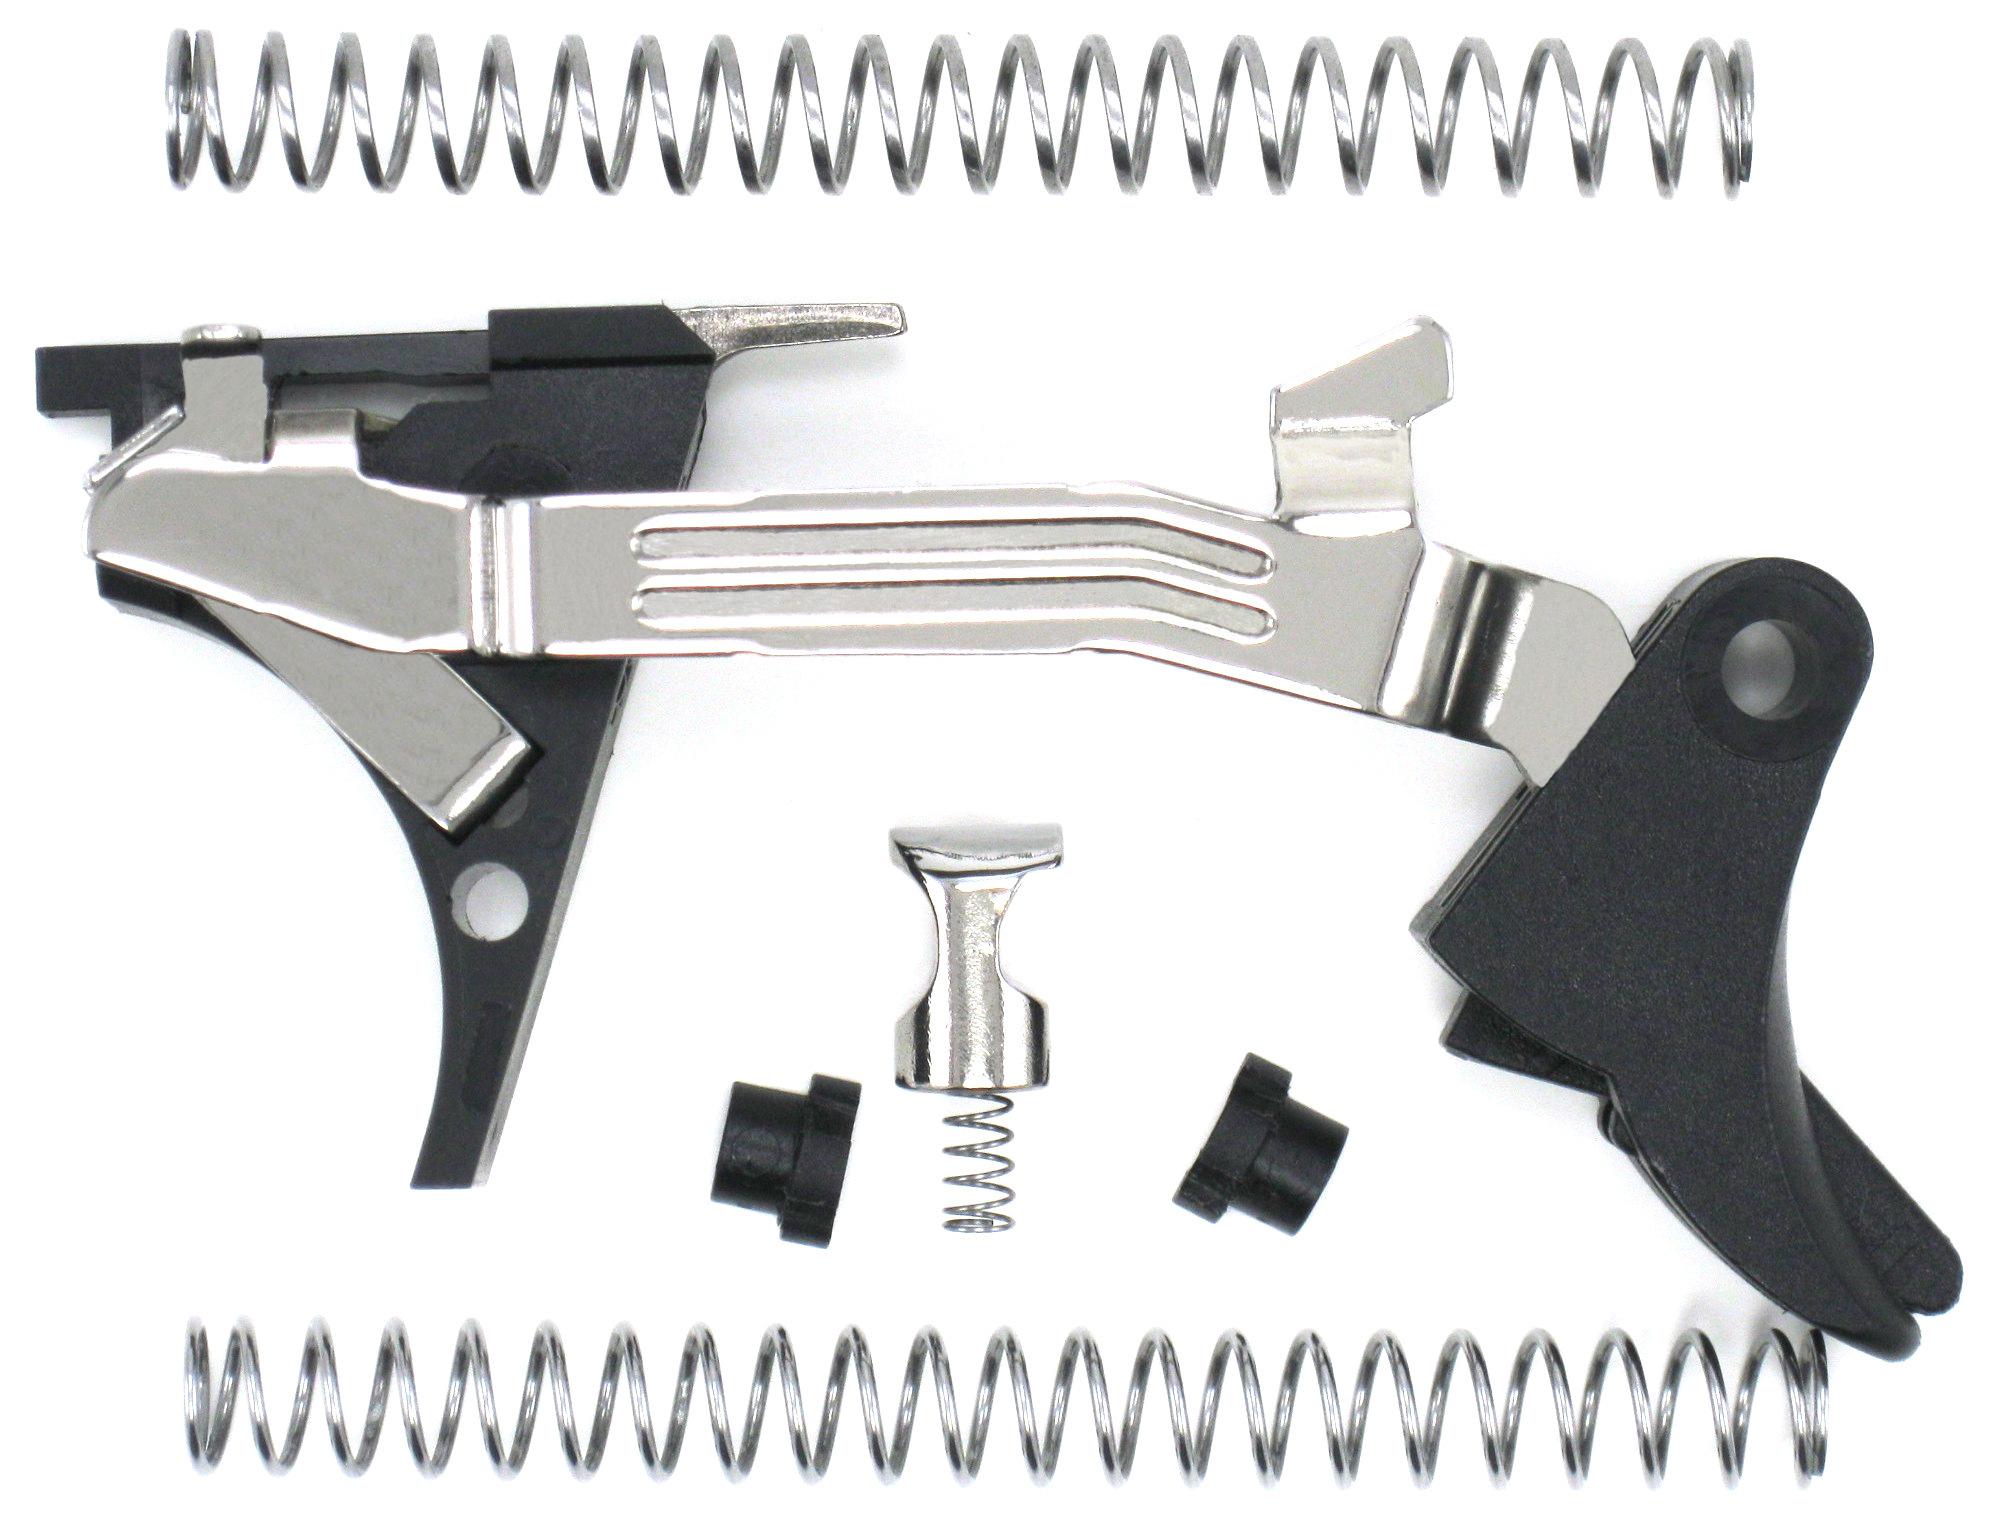 G42/G43 Trigger Kits -